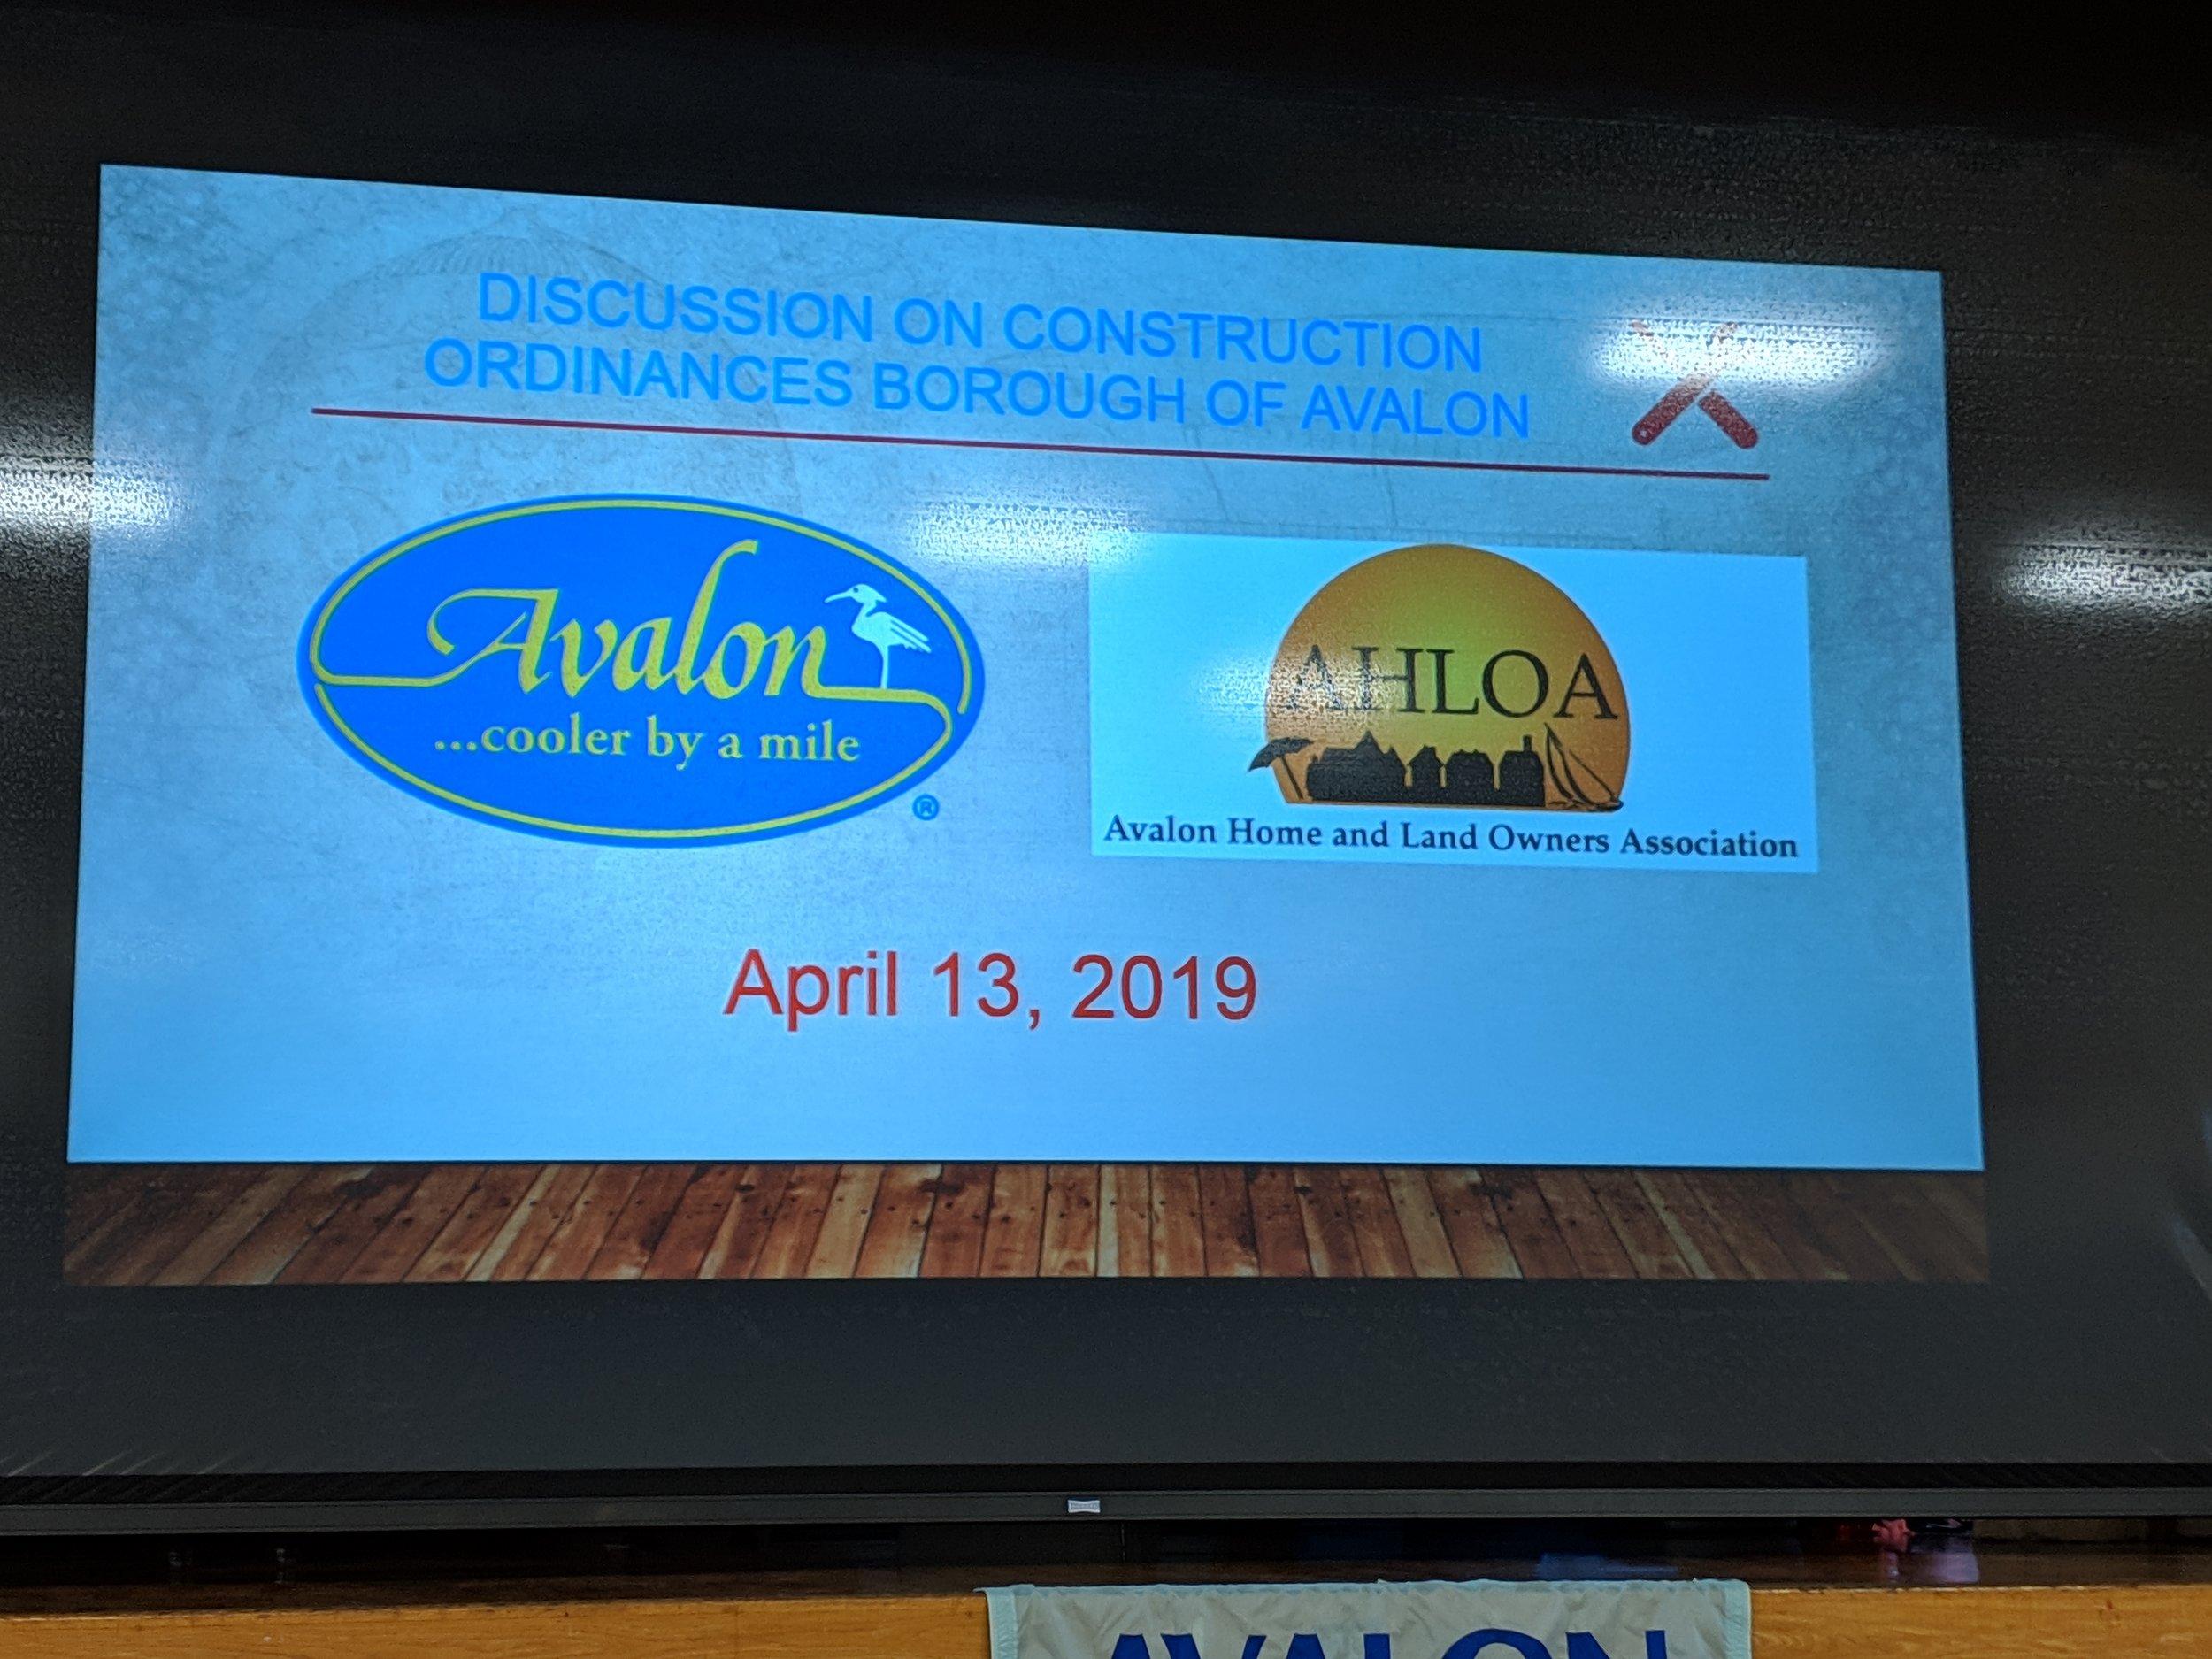 New Borough Construction Ordinances